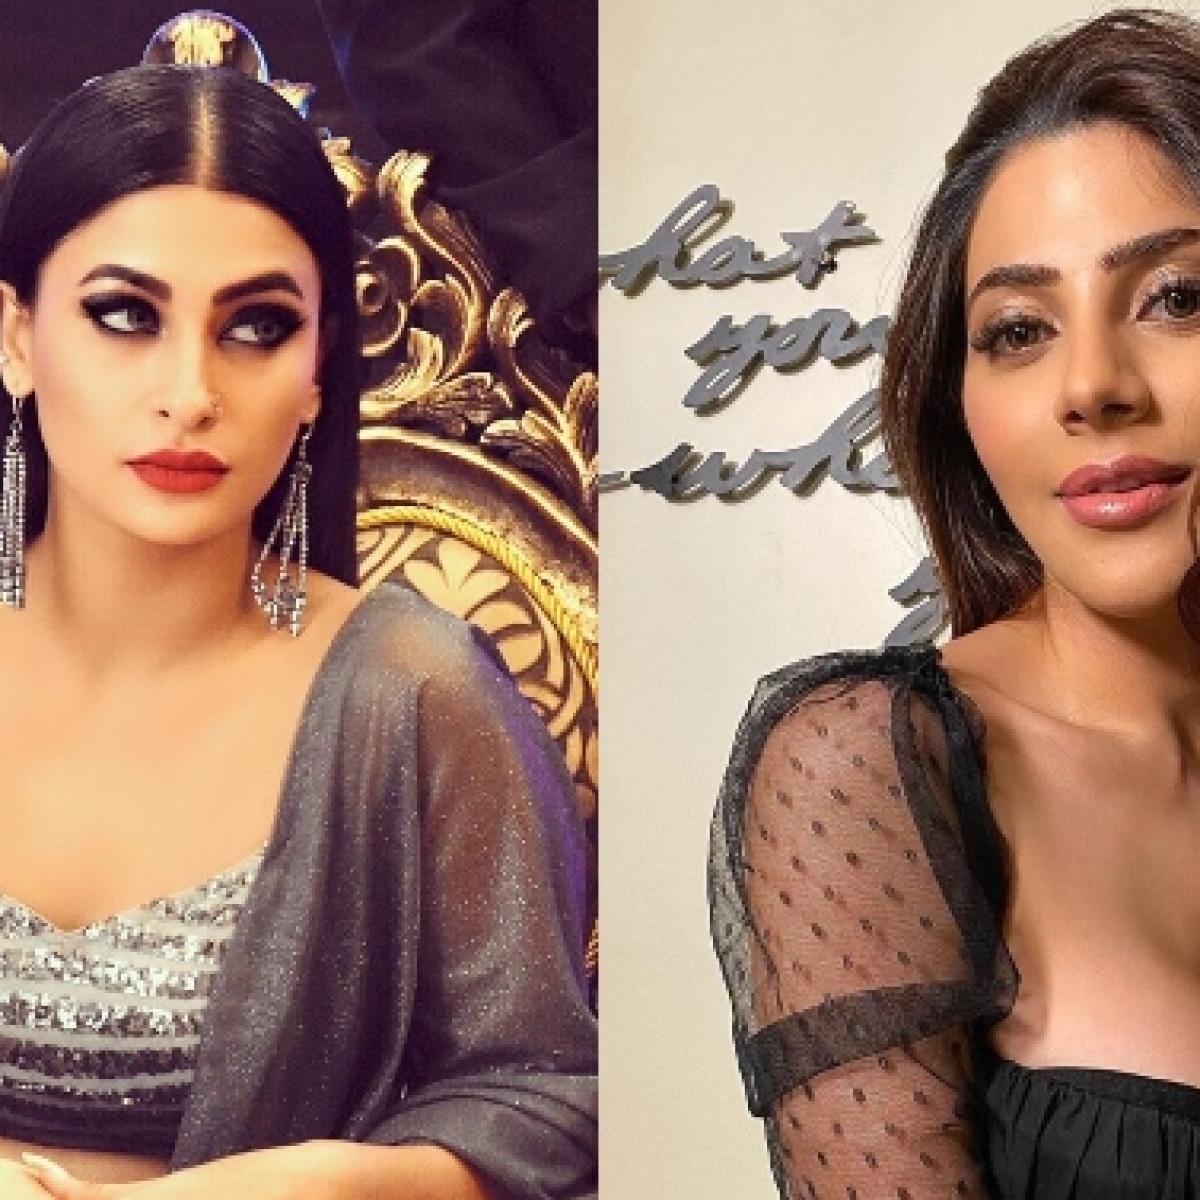 Bigg Boss 14: Pavitra Punia, Nikki Tamboli get into a catfight